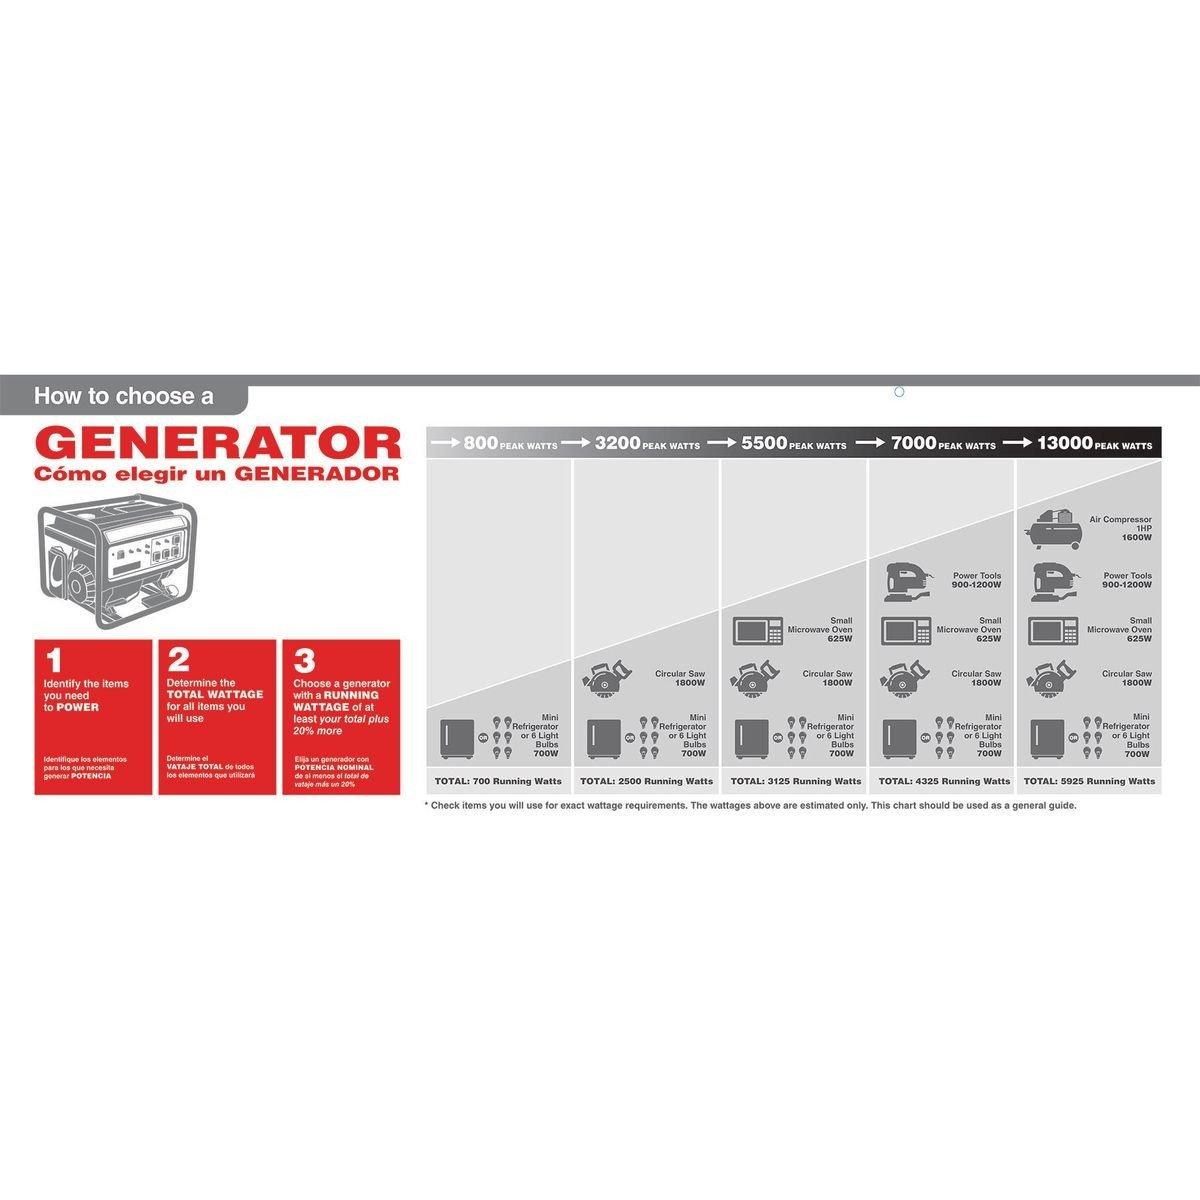 Amazon.com: 3500 Watt Super Quiet Inverter Generator: Home Improvement